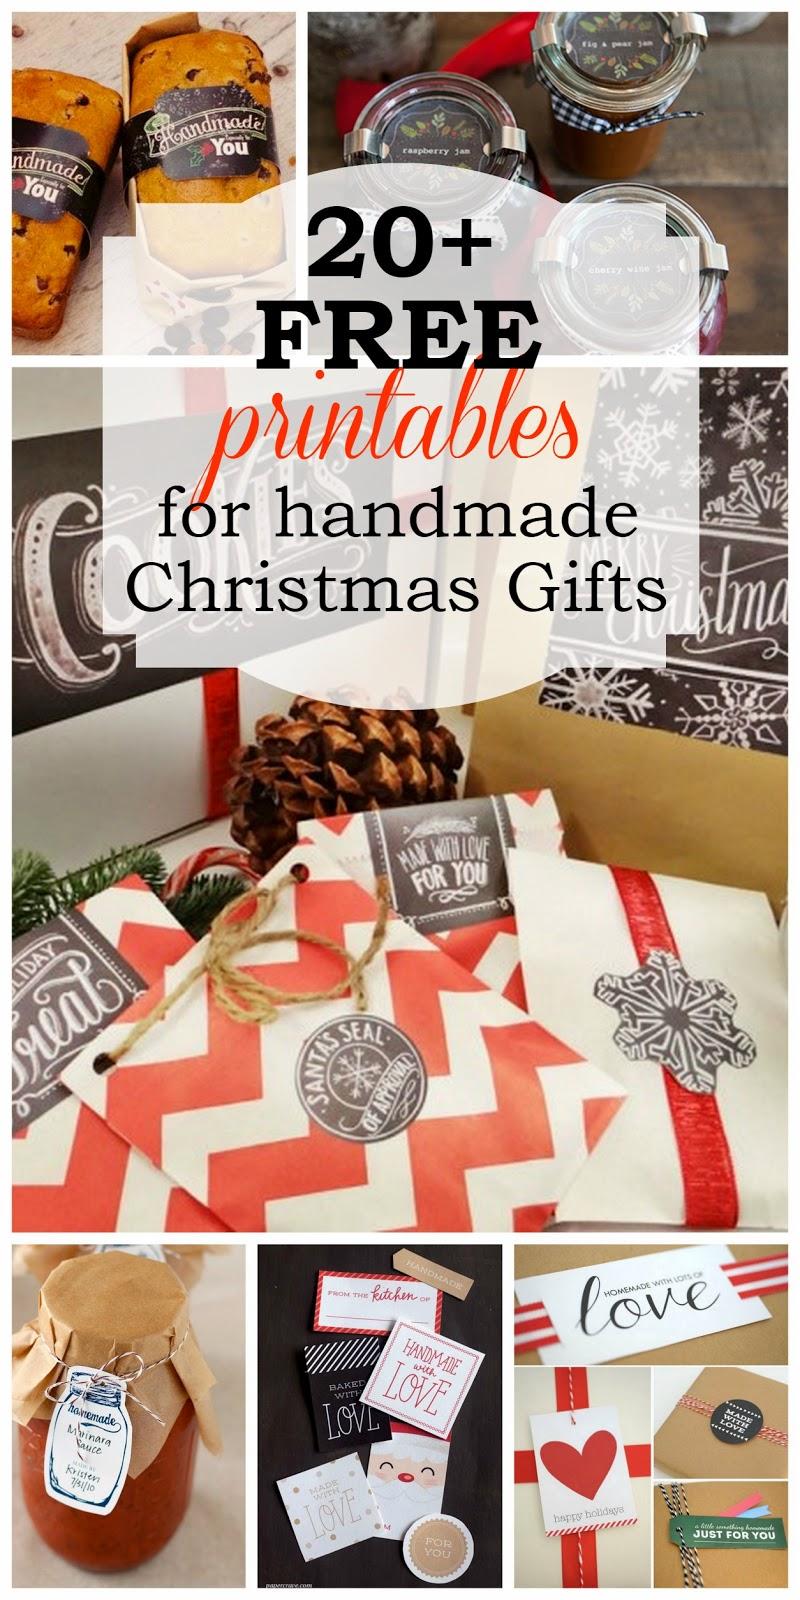 The Harris Sisters: Free Printables for Handmade Christmas Gifts